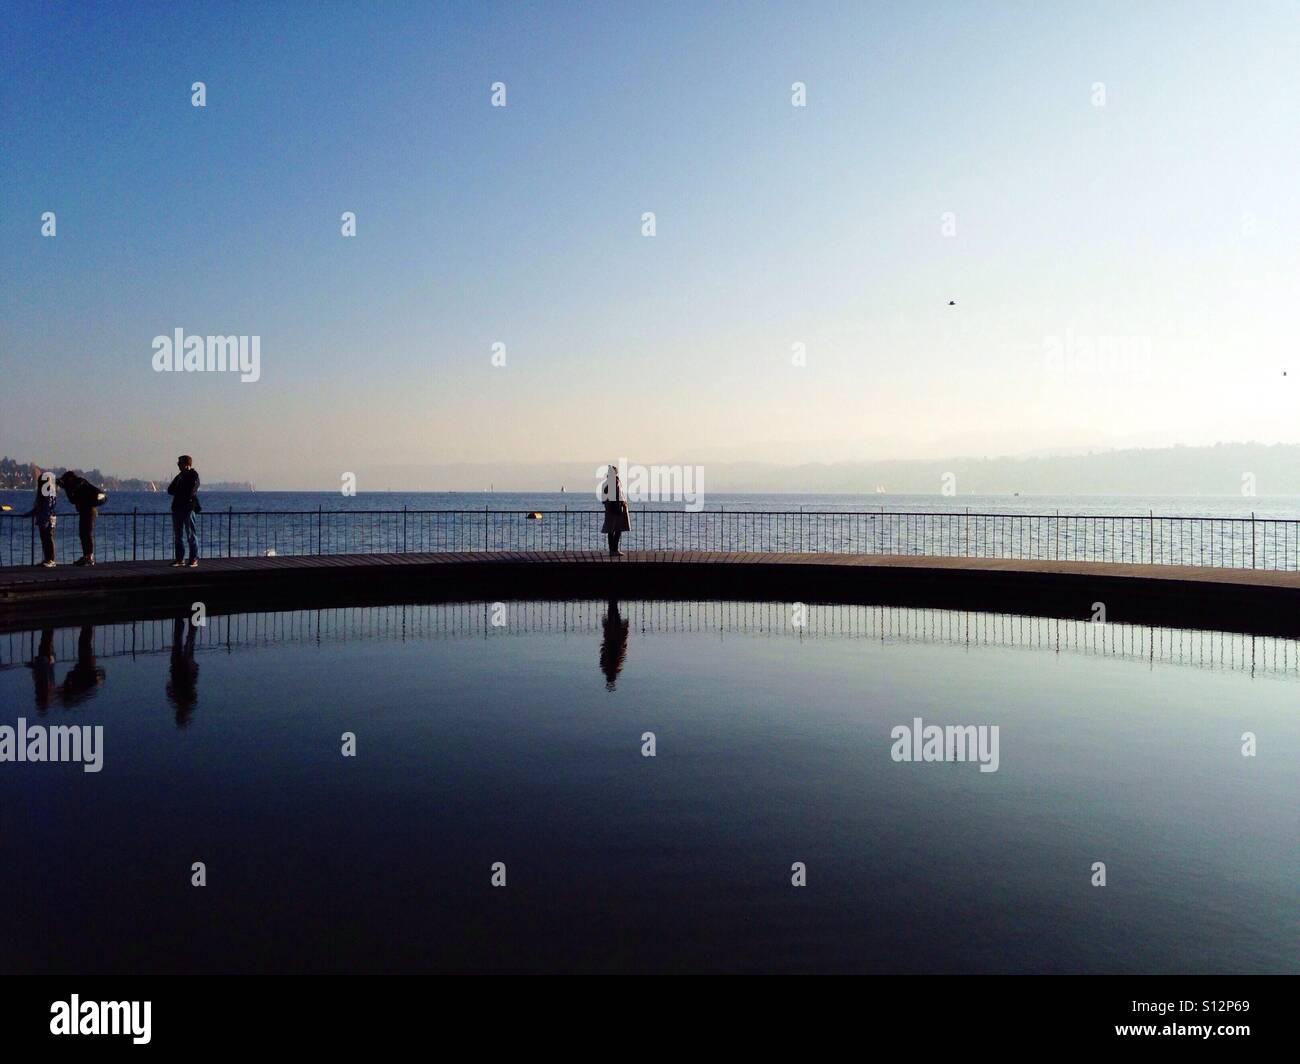 A swimming pool on lake Zurich, Switzerland. - Stock Image